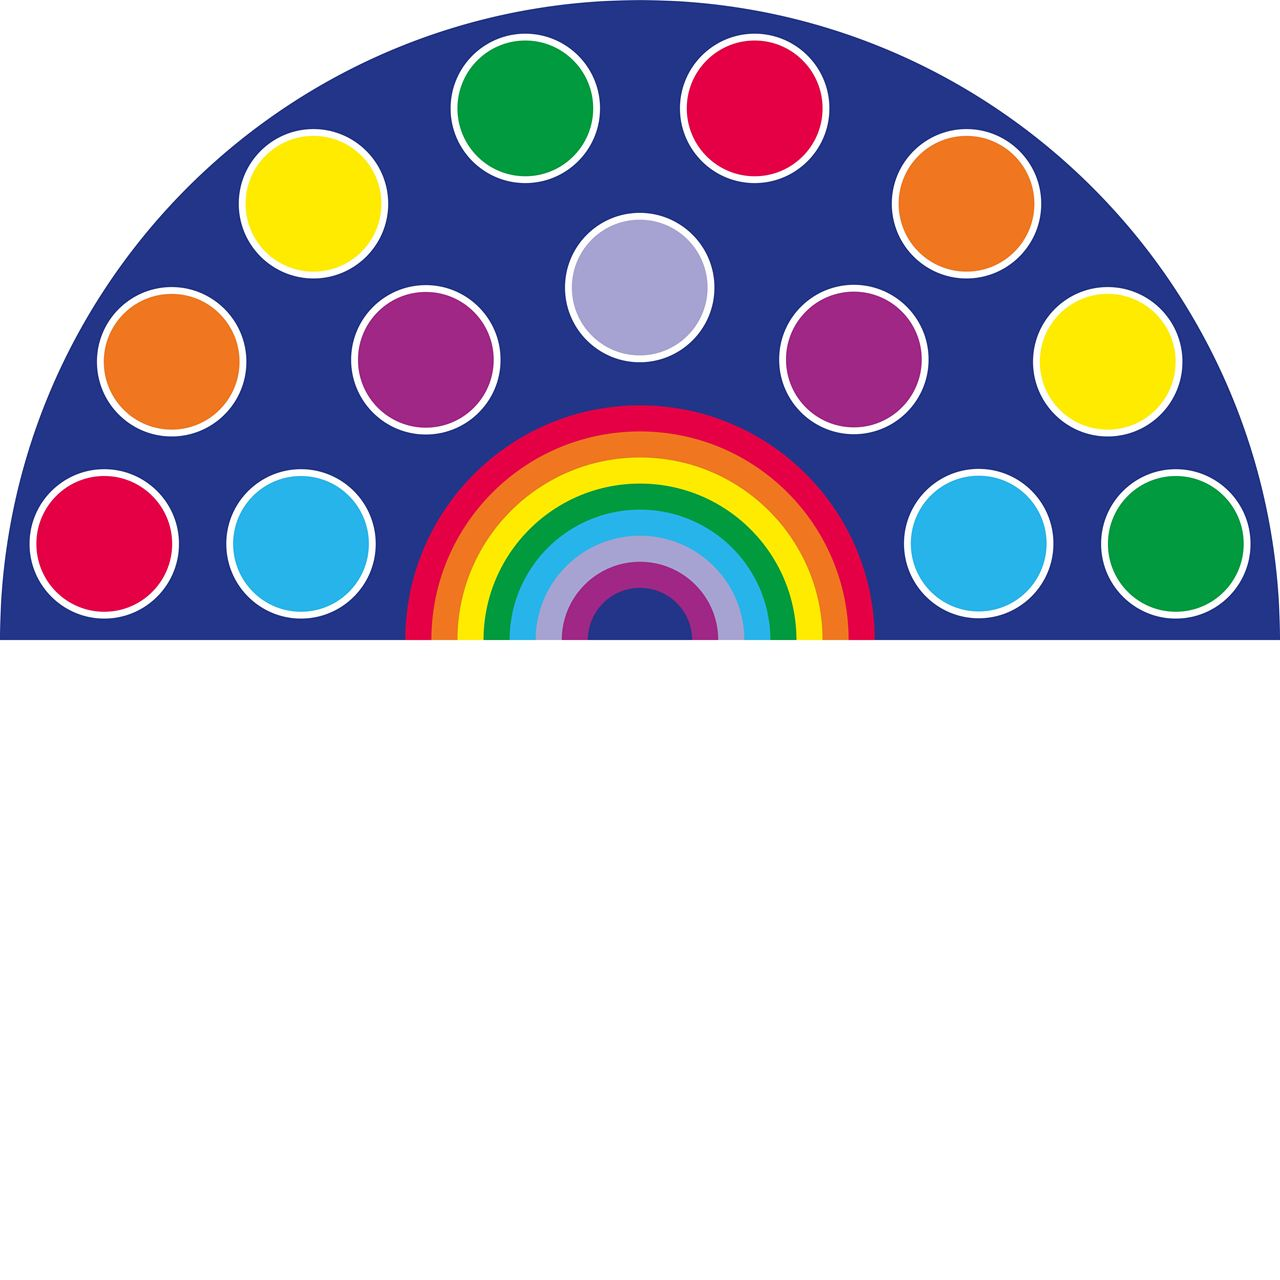 Carpet clipart rainbow Circles Rainbow Carpet schools Carpet